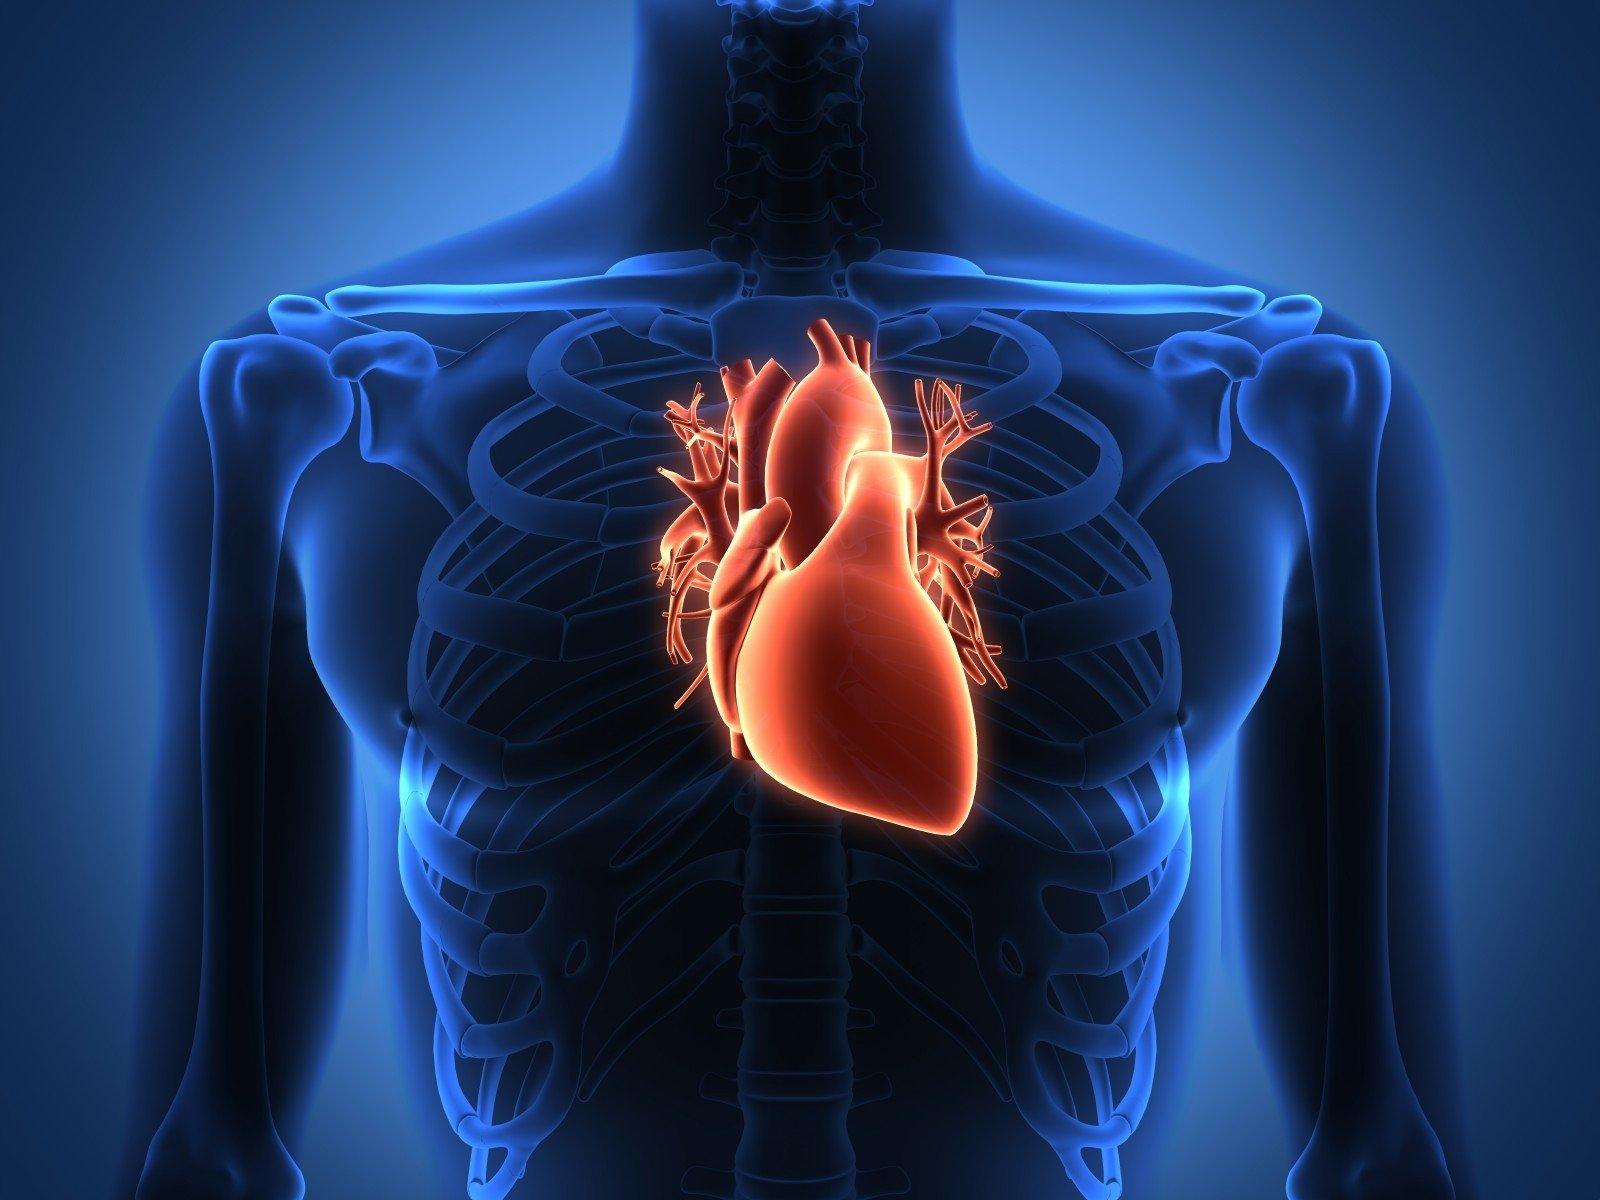 širdies sveikata po menopauzės